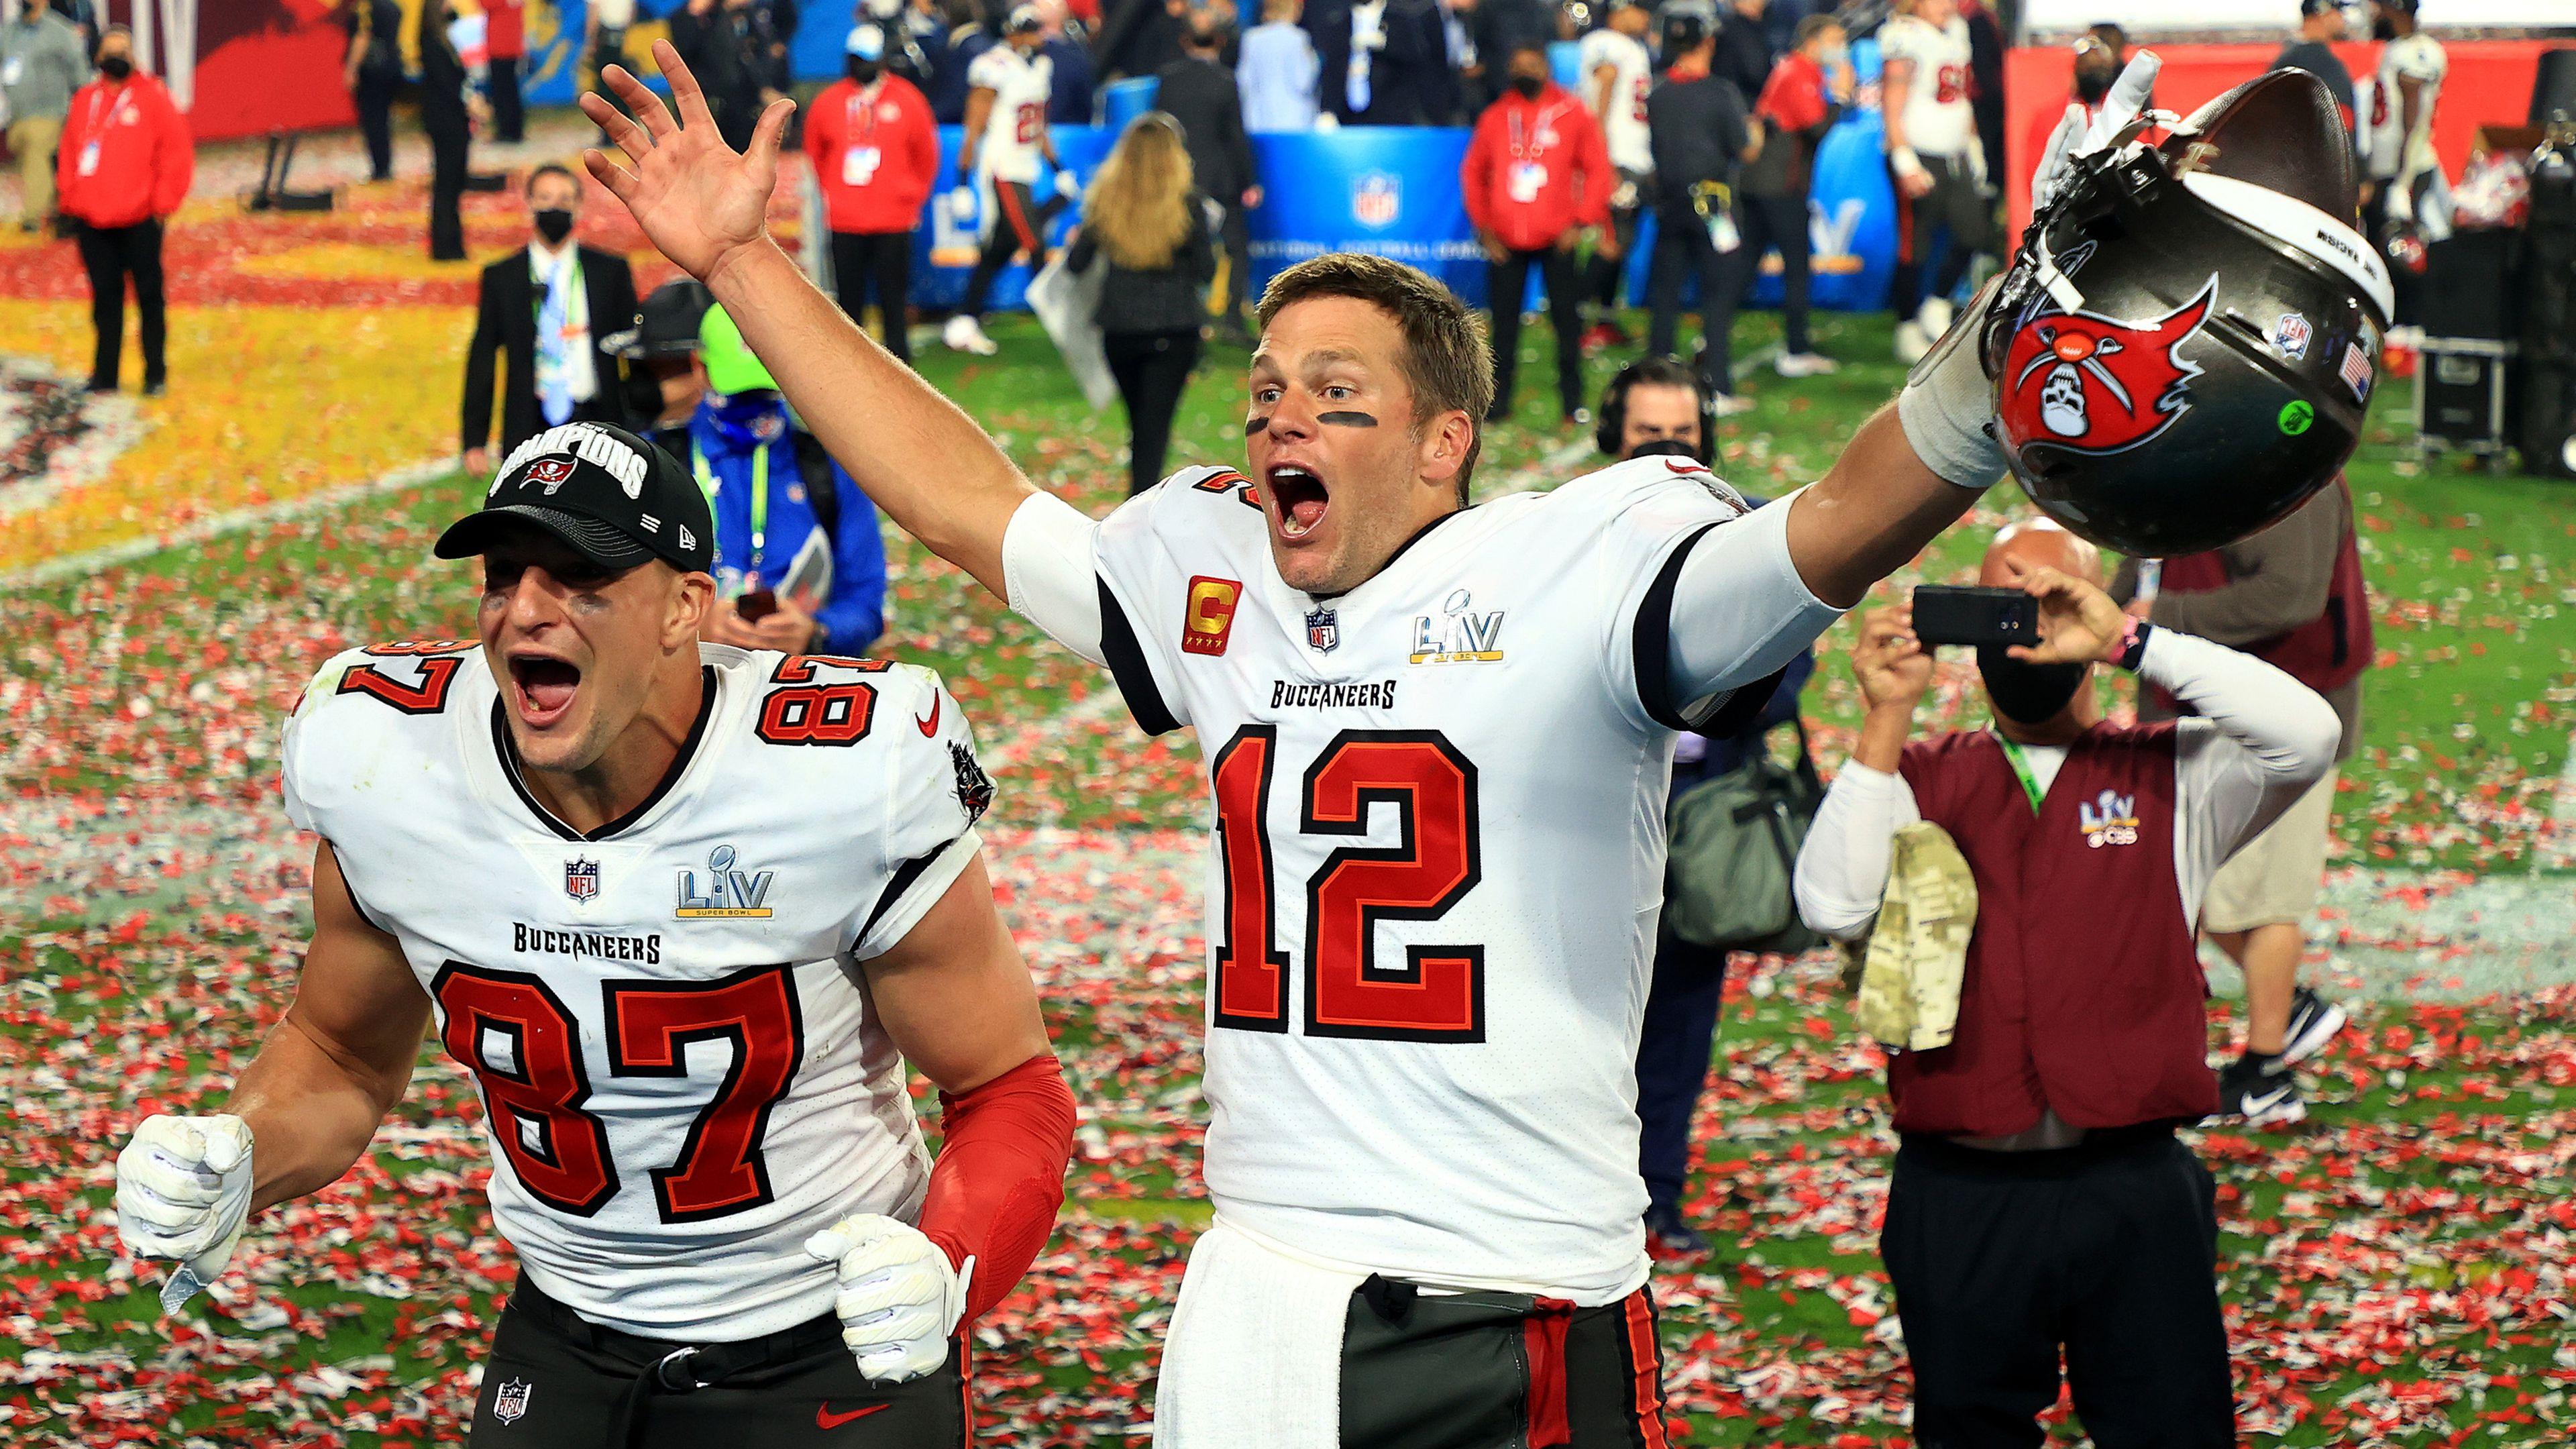 Punter wins big as ridiculous Super Bowl bet prevails